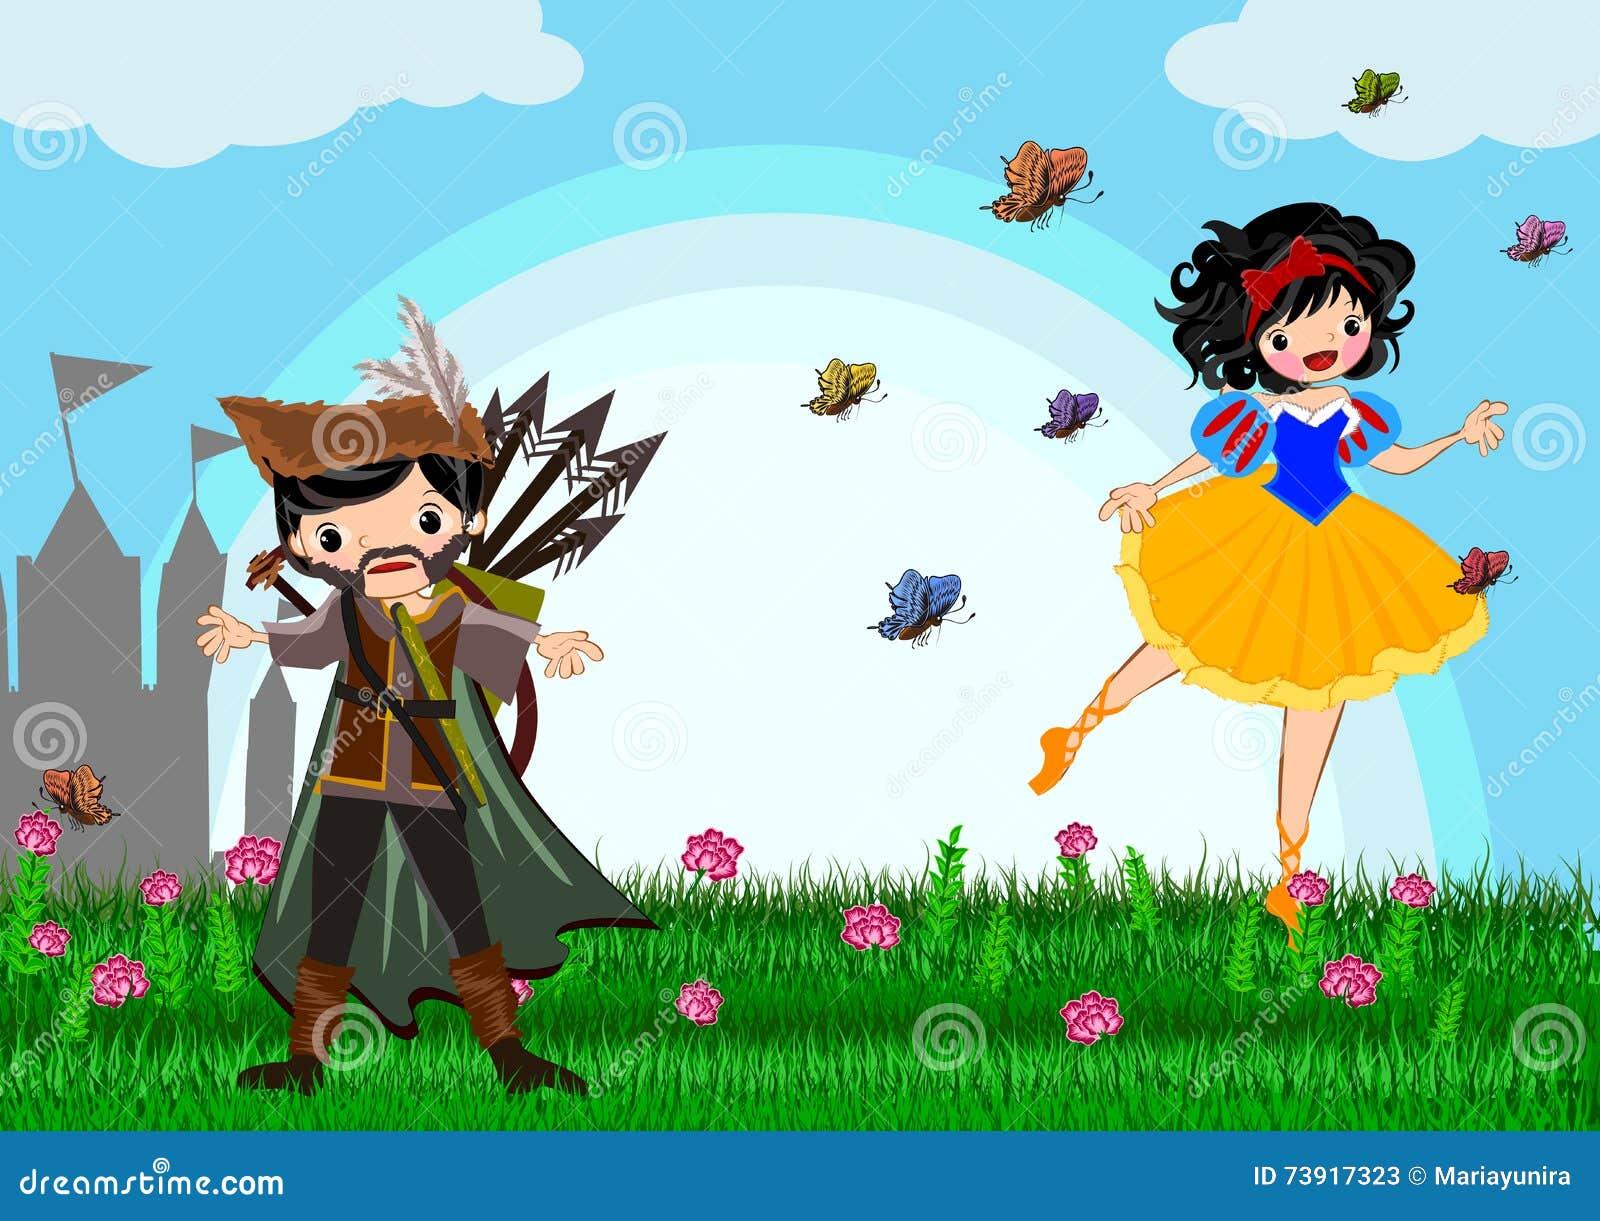 Snow white stock illustration  Illustration of princess - 73917323